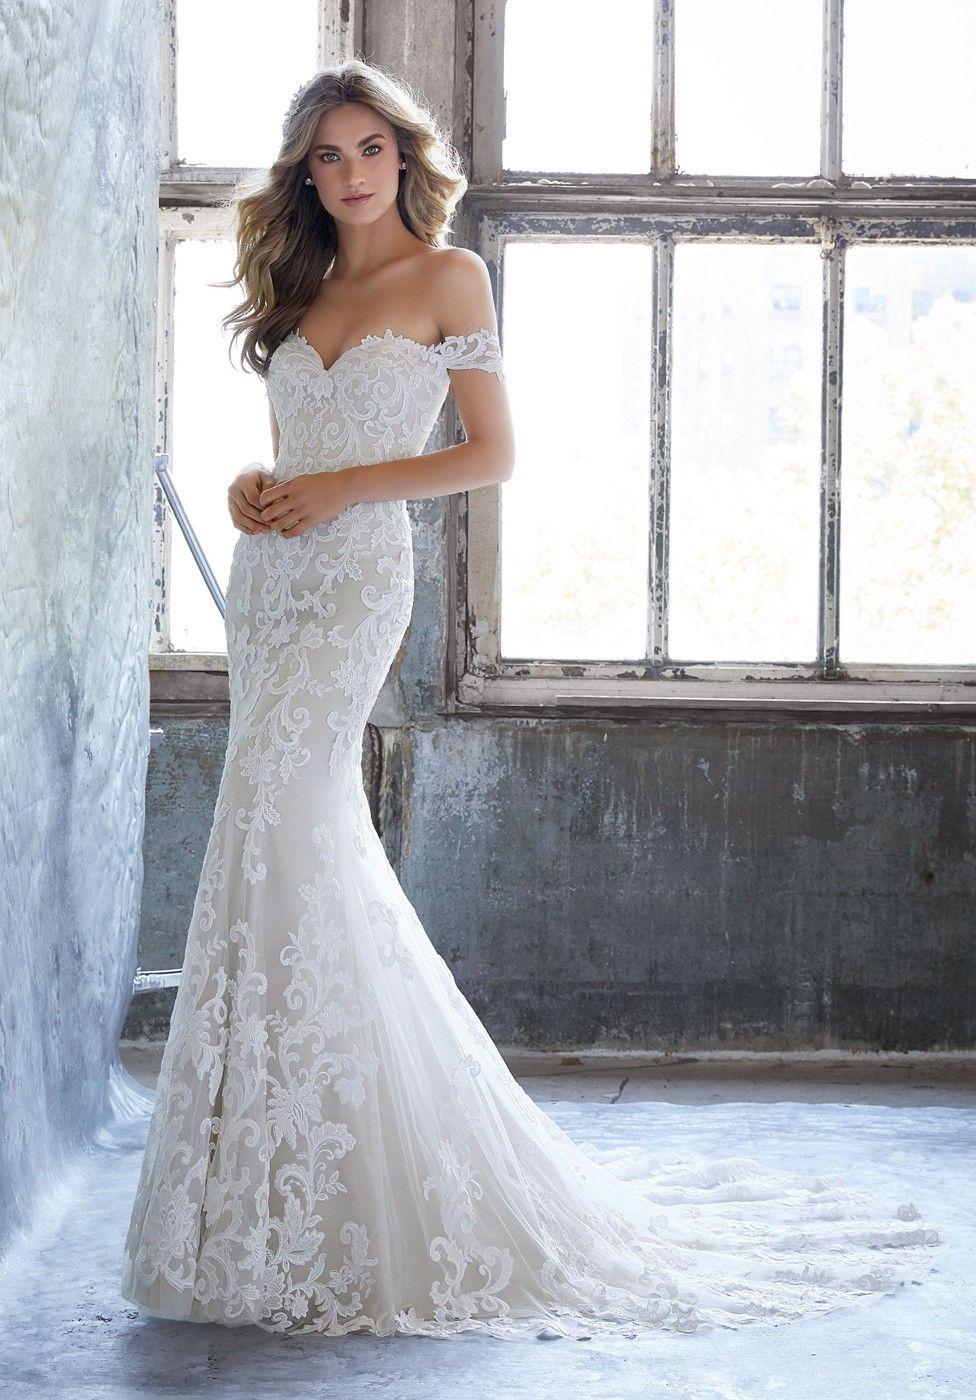 c41cd4a0a128 Mori Lee Kassia Style 8203 Dress - MadameBridal.com #weddingdresses #wedding  #bride #morilee #morileewedding